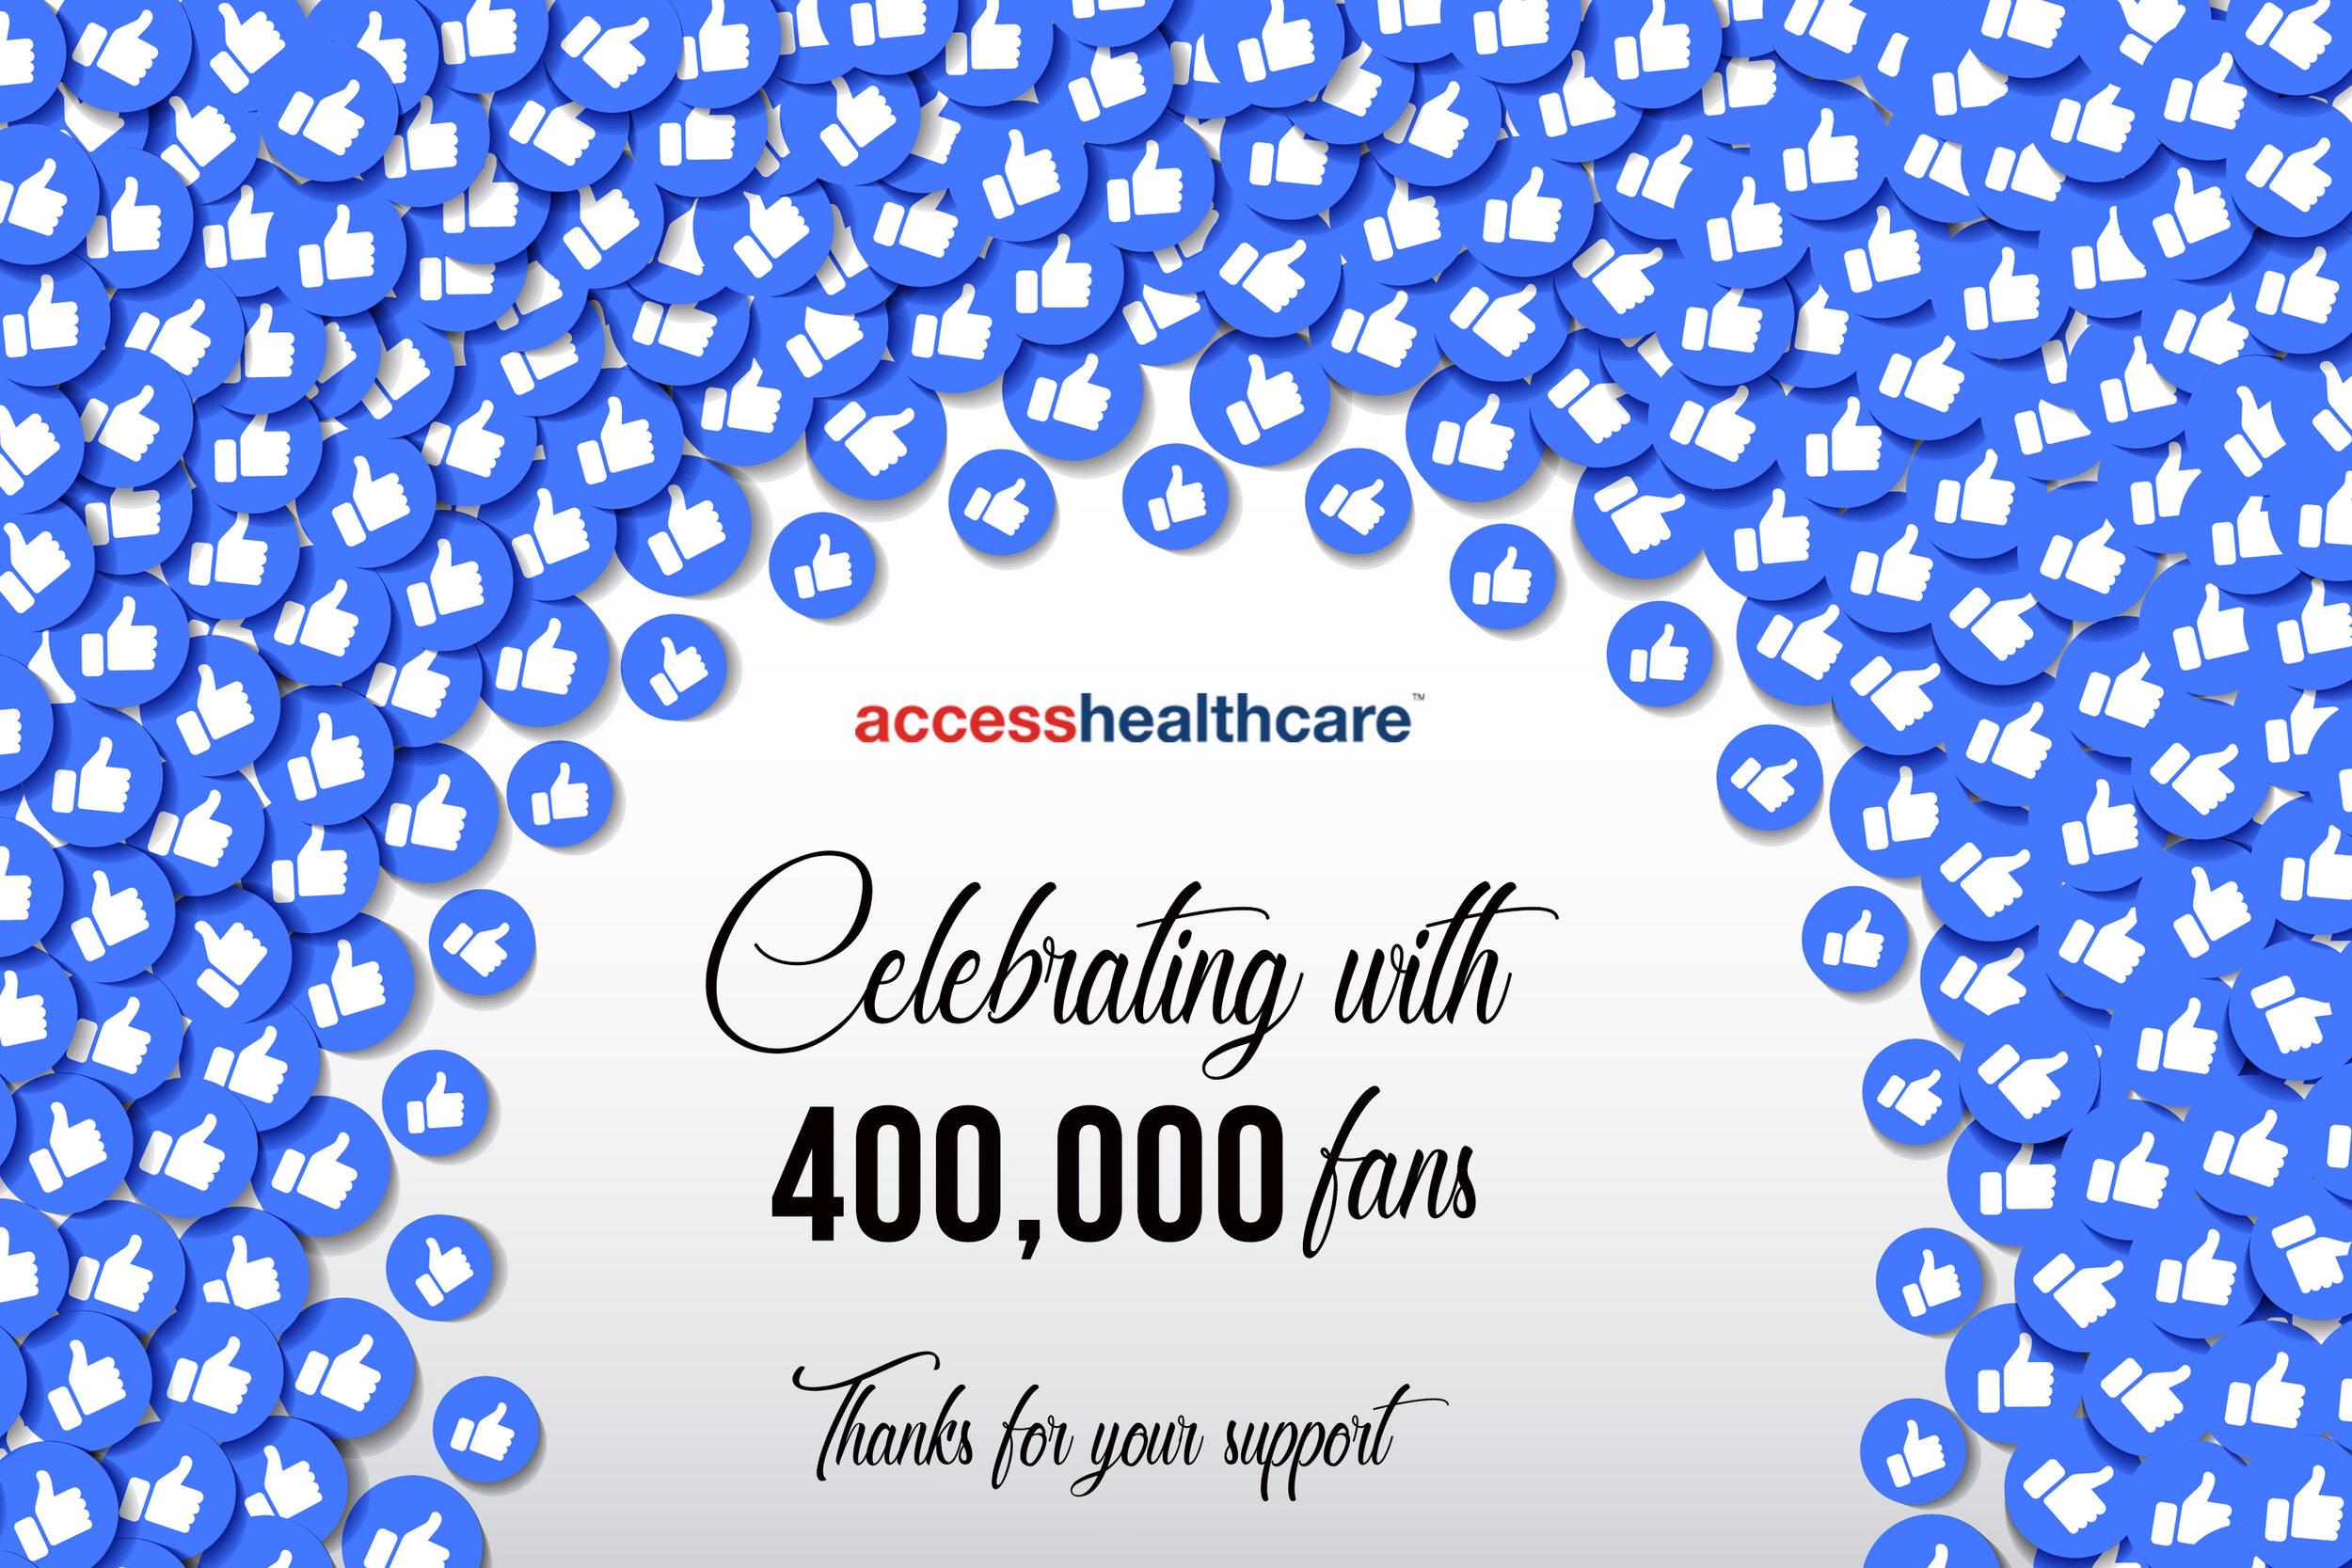 400k_Followers_on_Facebook.jpg